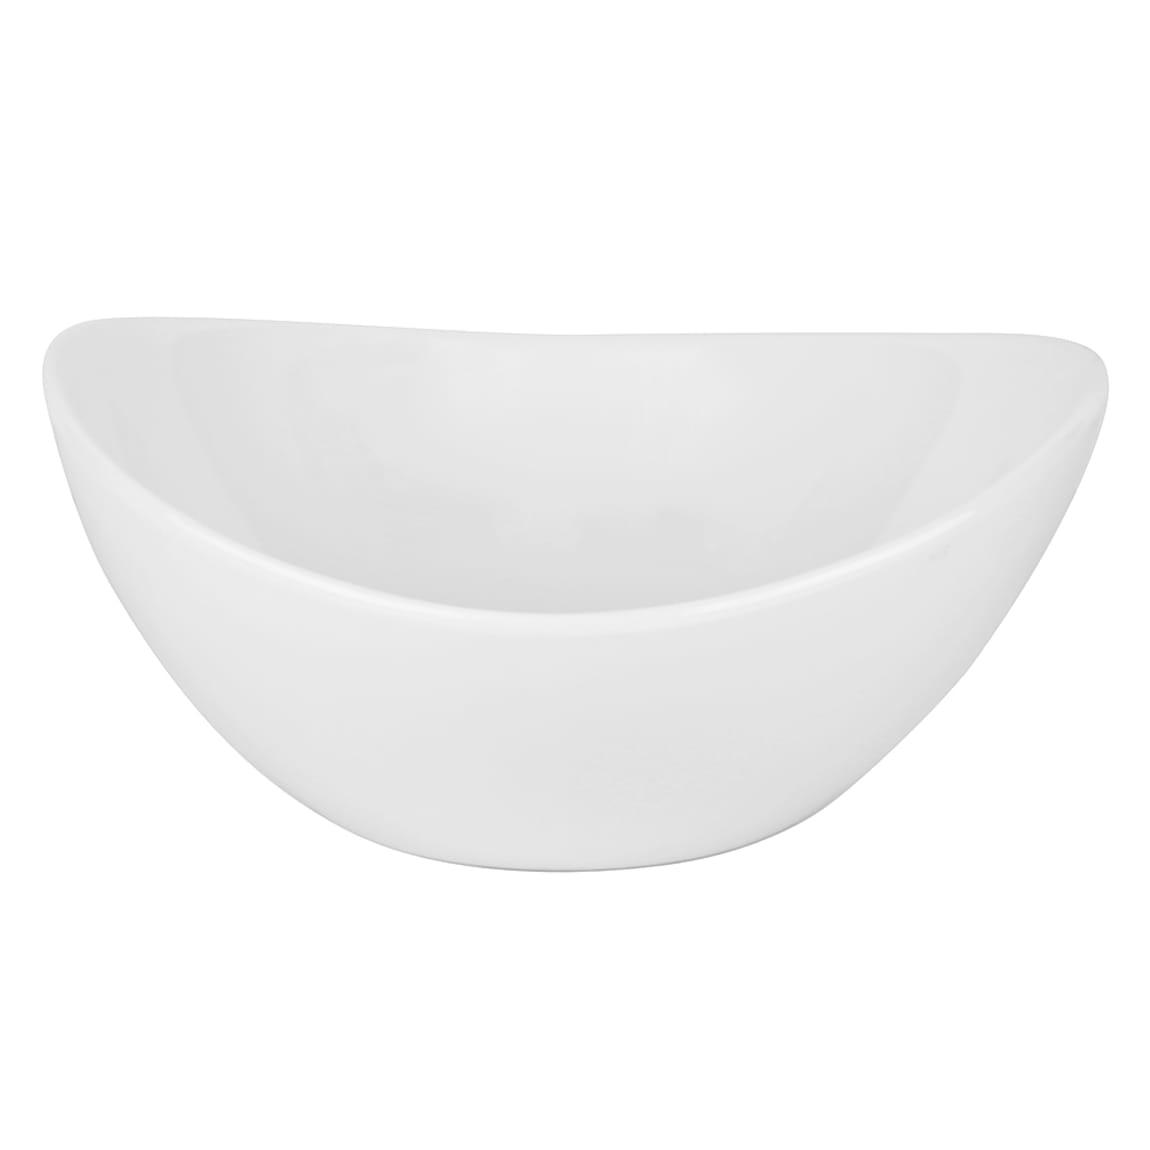 10 Strawberry Street A19480 10 oz Oval Boat Bowl - Porcelain, White